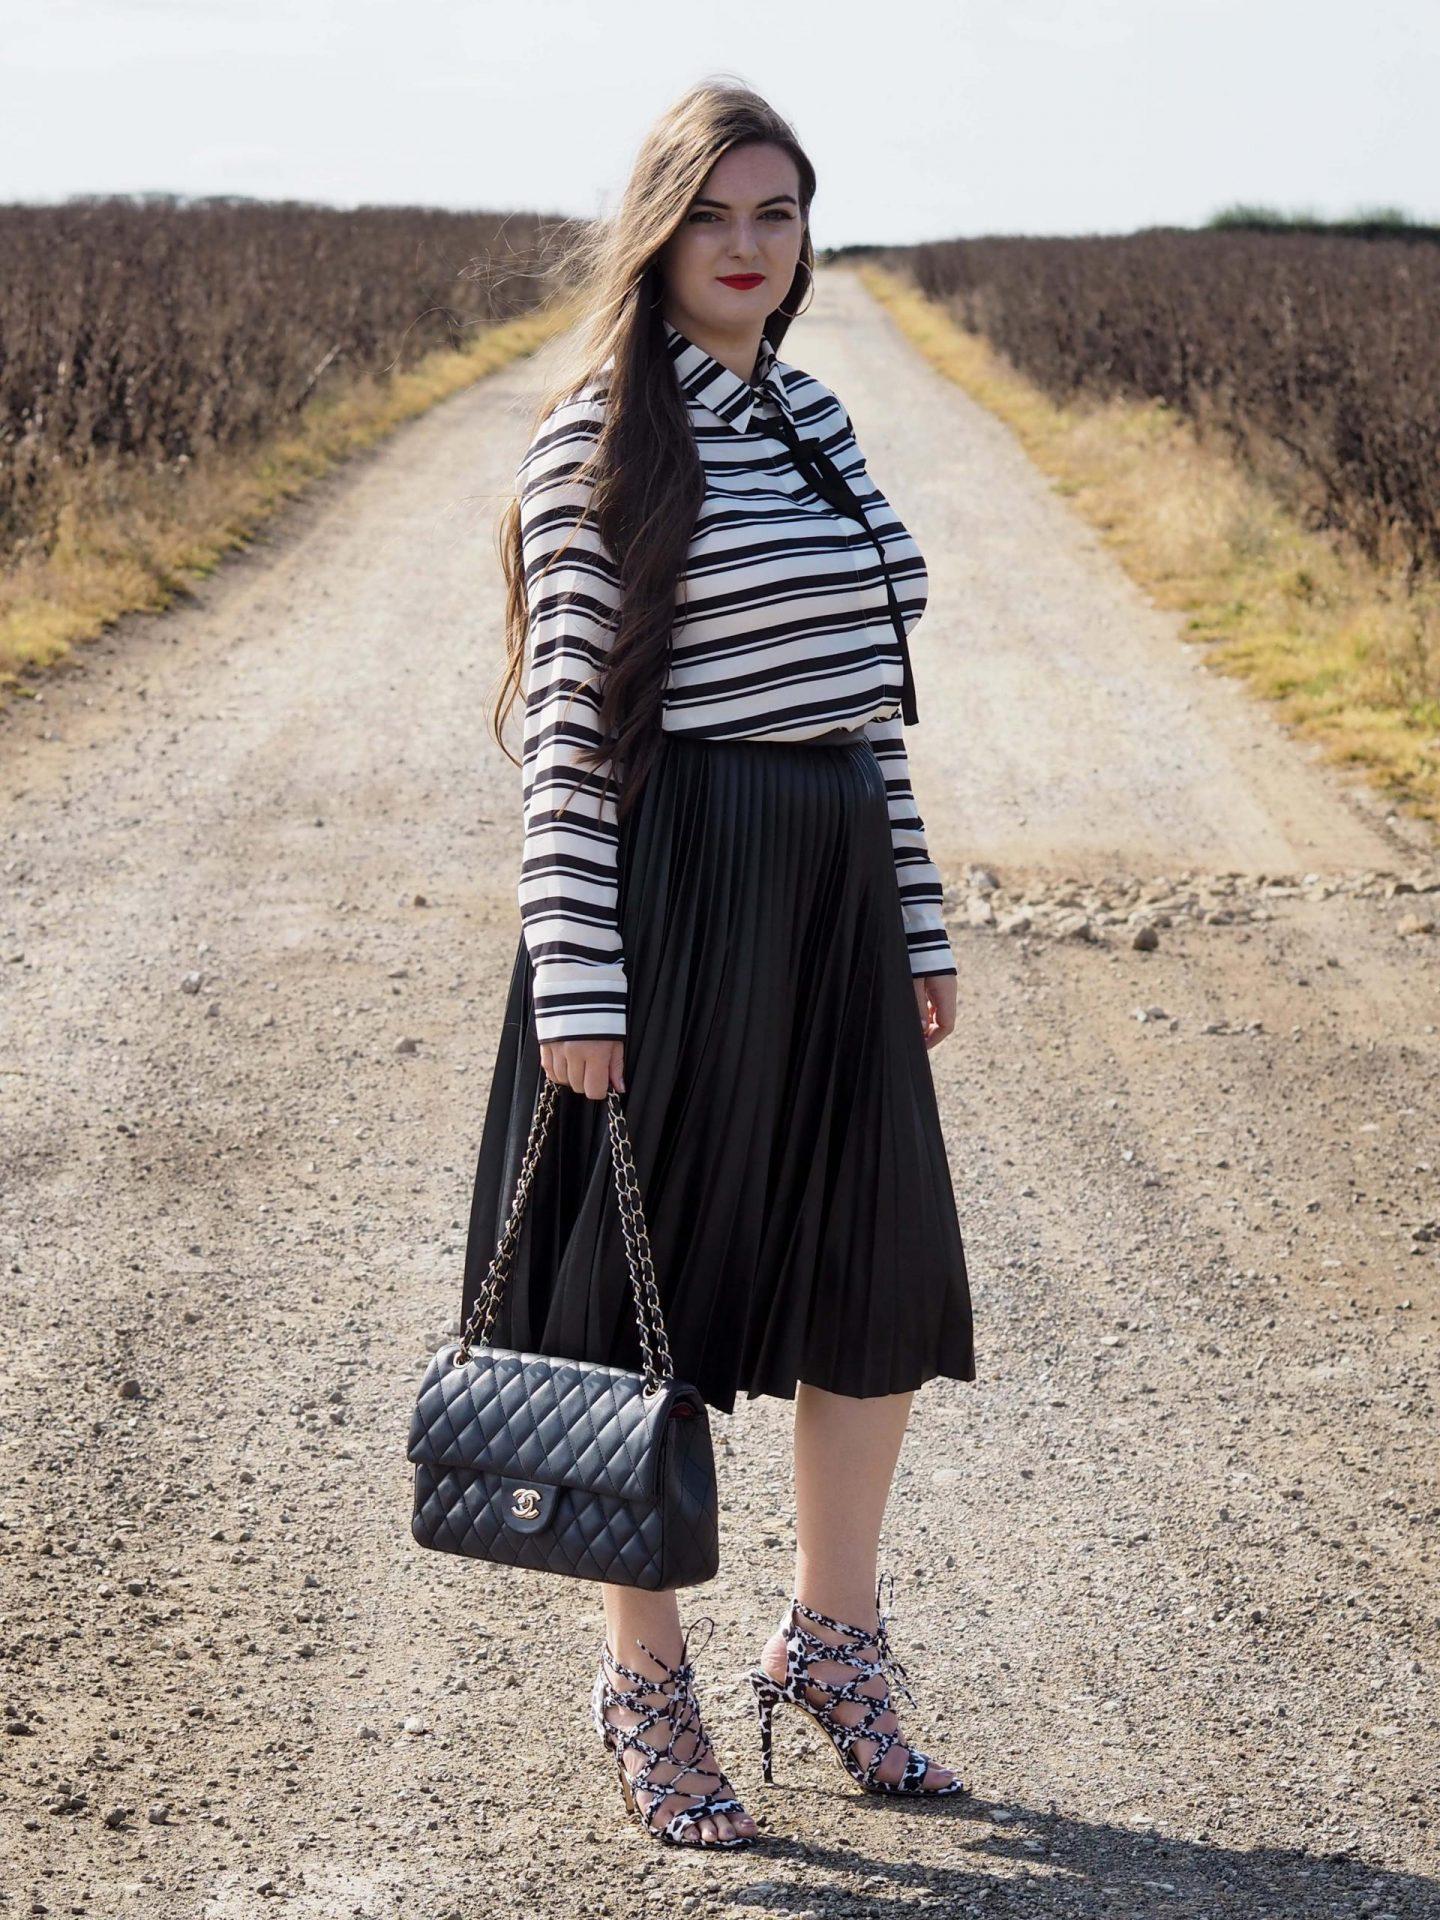 closet-leather-pleated-skirts-and-stripes-rachel-nicole-uk-blogger-5